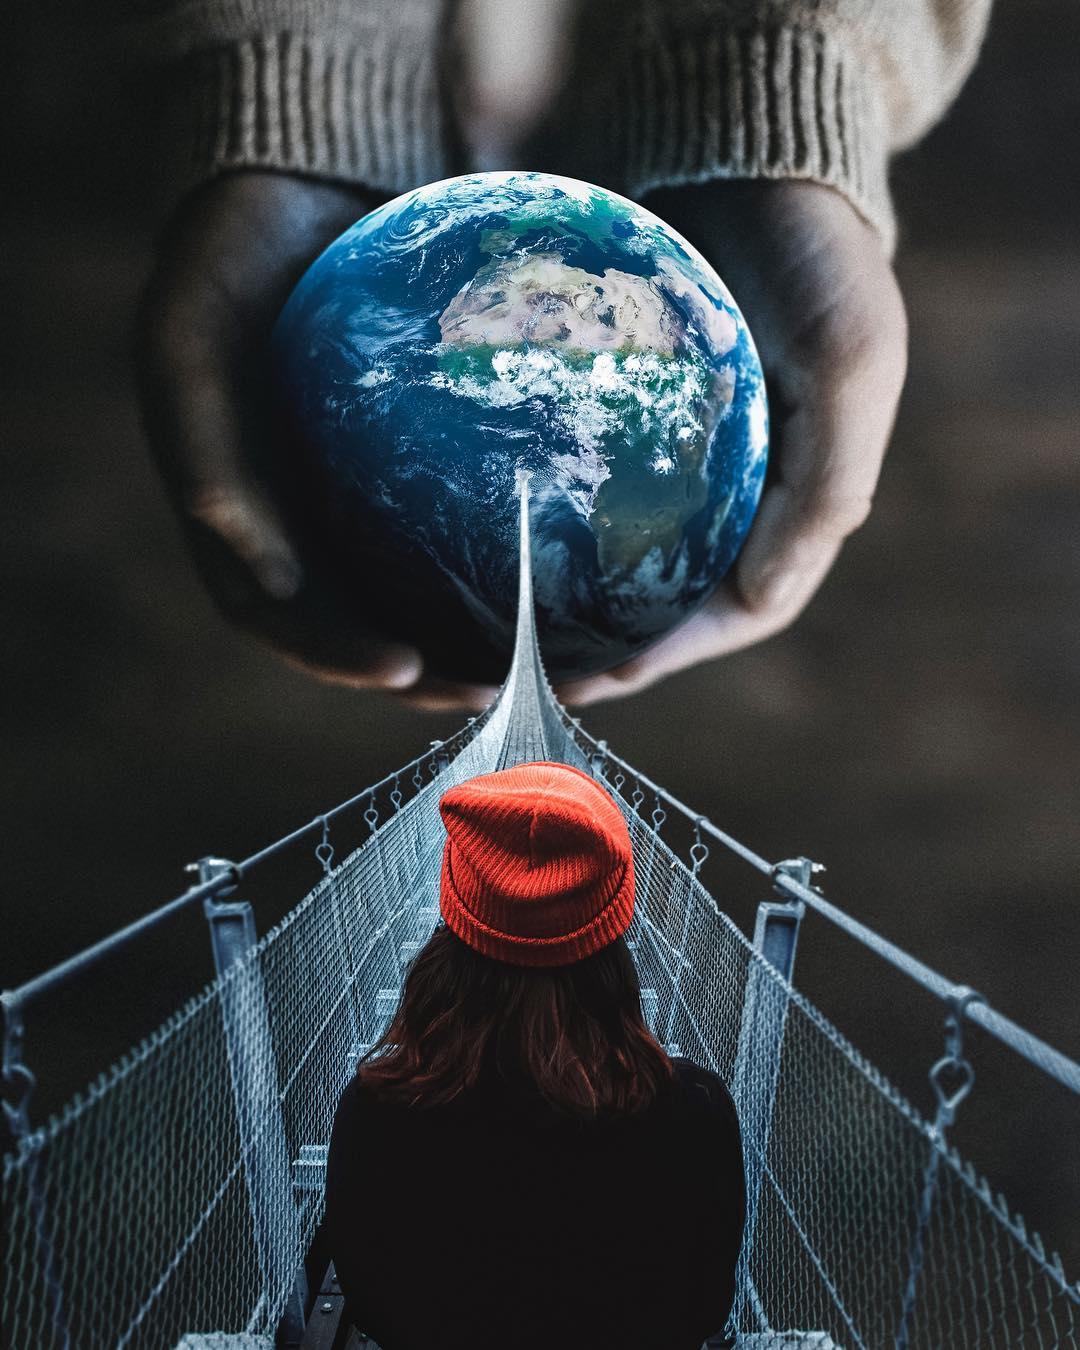 Сюрреалистические фотоманипуляции от Джастина Питерса